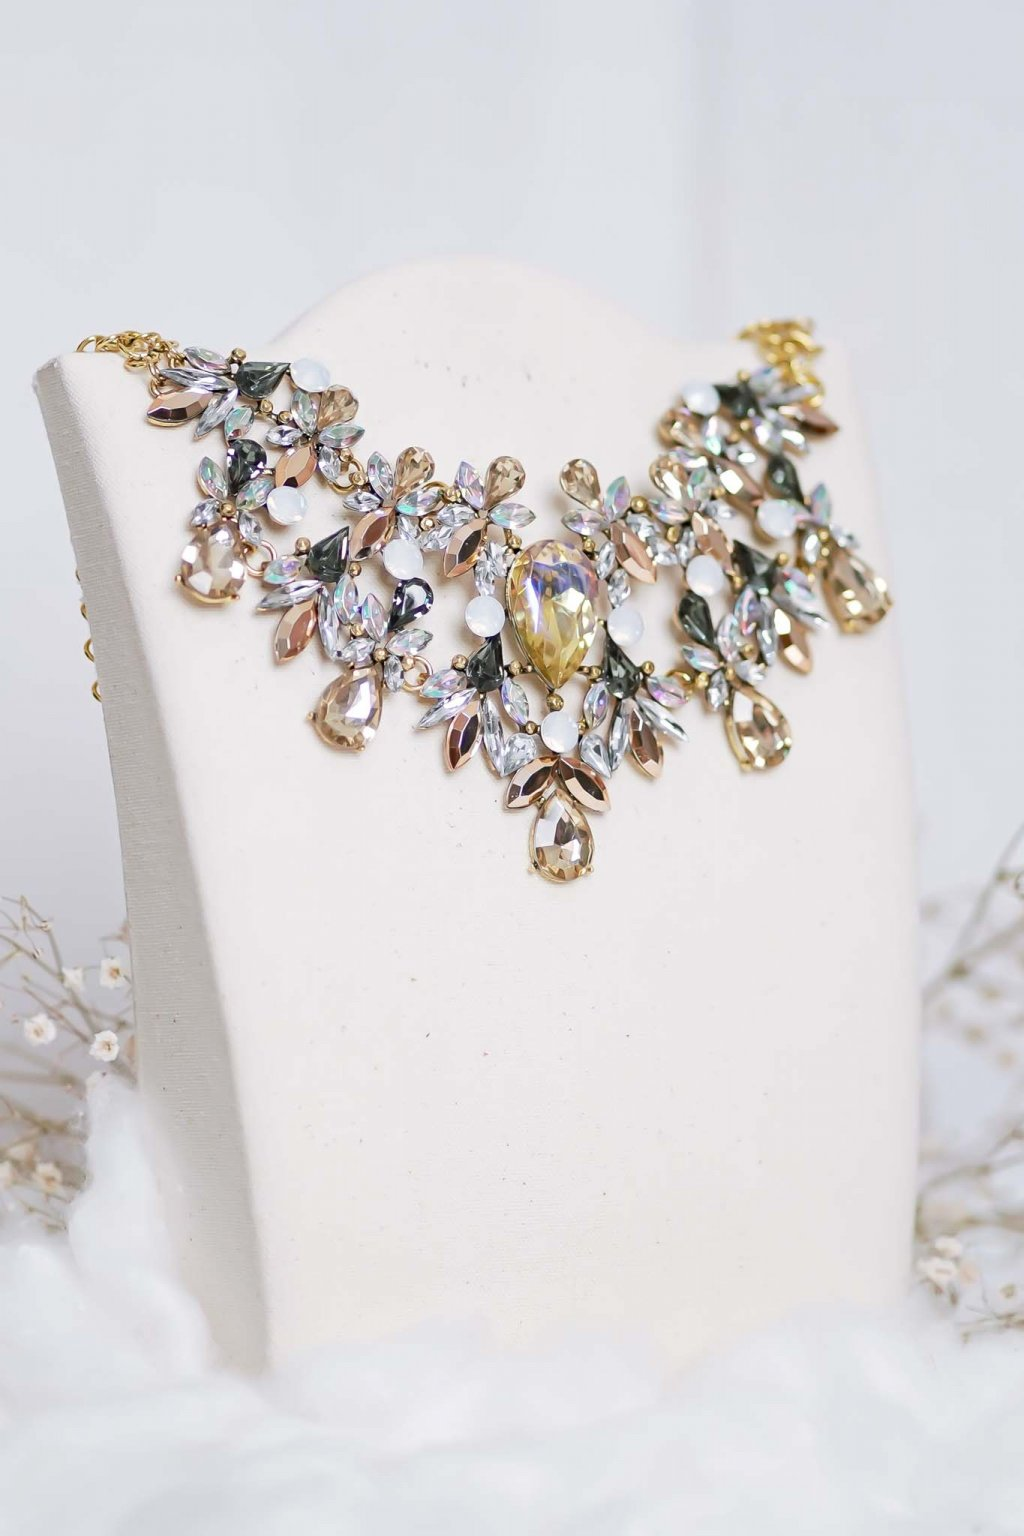 náhrdelník, šperk, spoločenská náhrdelník, náhrdelník na bežný deň, výrazný náhrdelník, jemný náhrdelník, šperky, náhrdelník na ples, svadbu, stužkovú 68